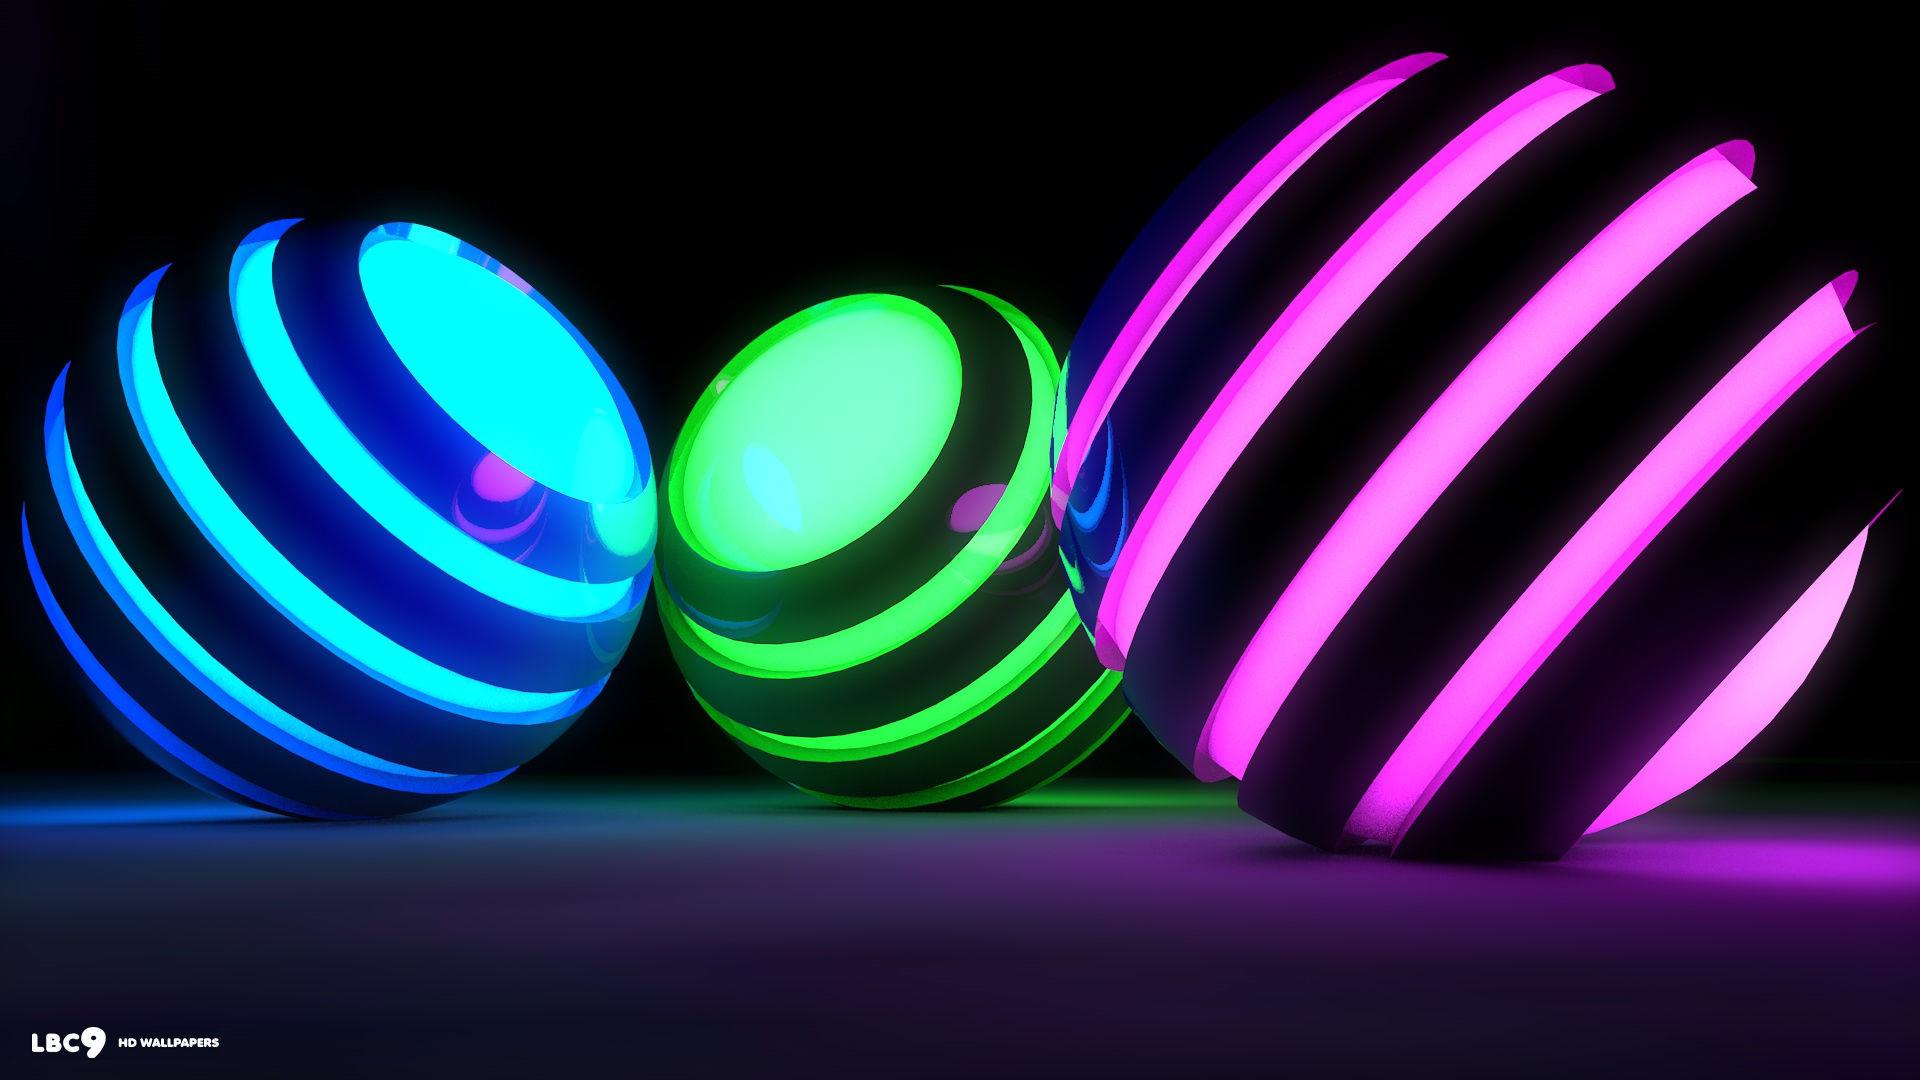 Res: 1920x1080, Wallpapers For > Neon Rainbow Backgrounds 3d 3d neon spheres  ...